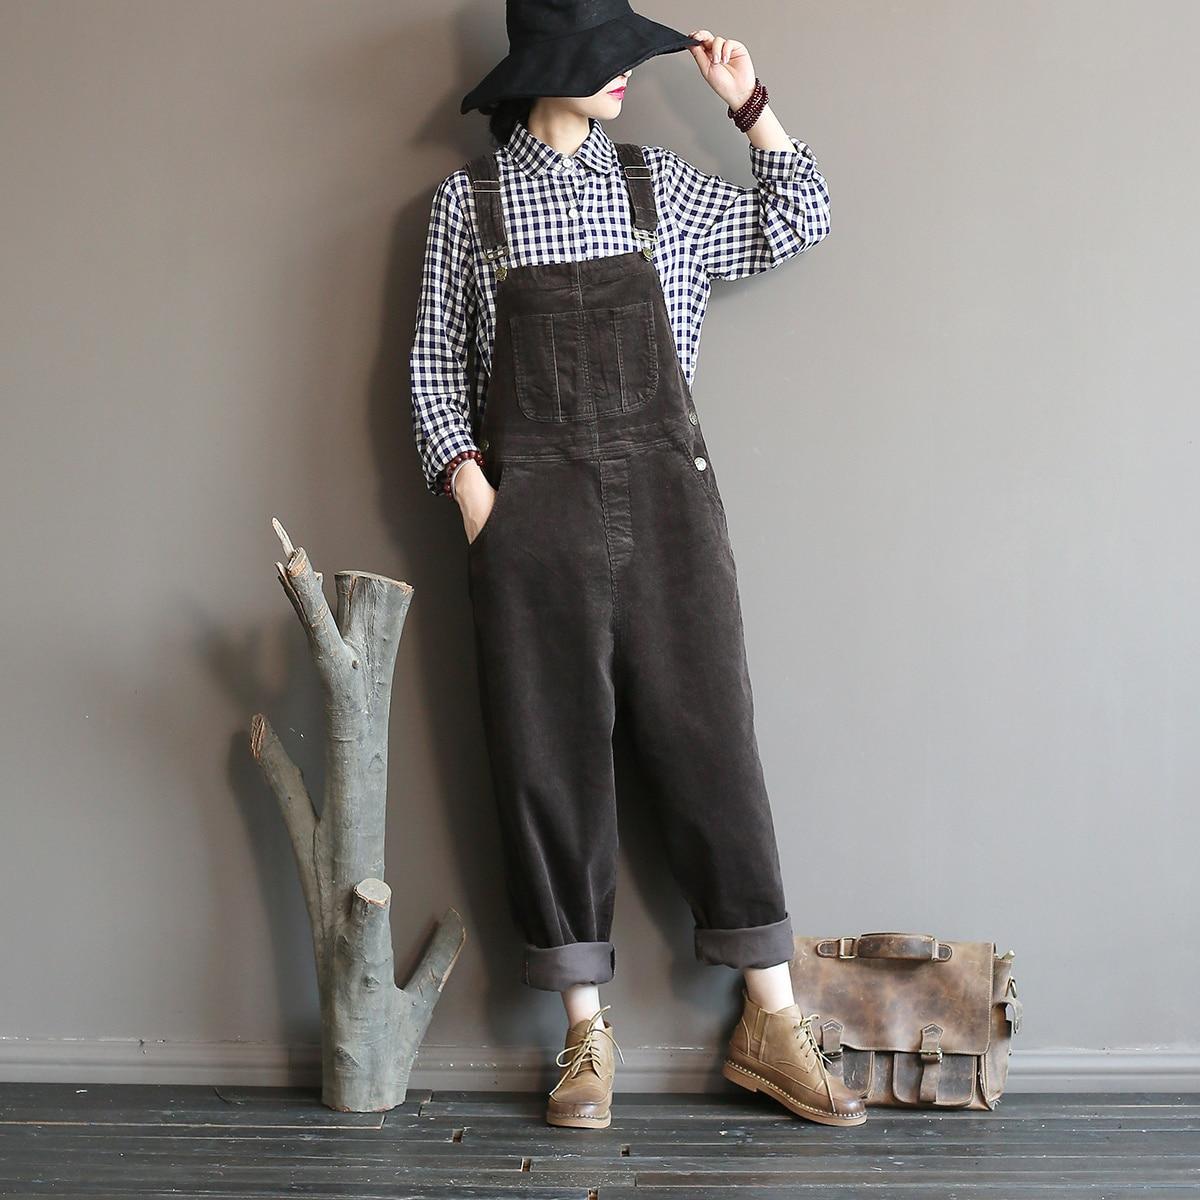 Johnature 2021 Autumn Winter New Original Jumpsuits Cotton Corduroy Women Vintage Loose Strap Thick Warm Pocket Casual Jumpsuits